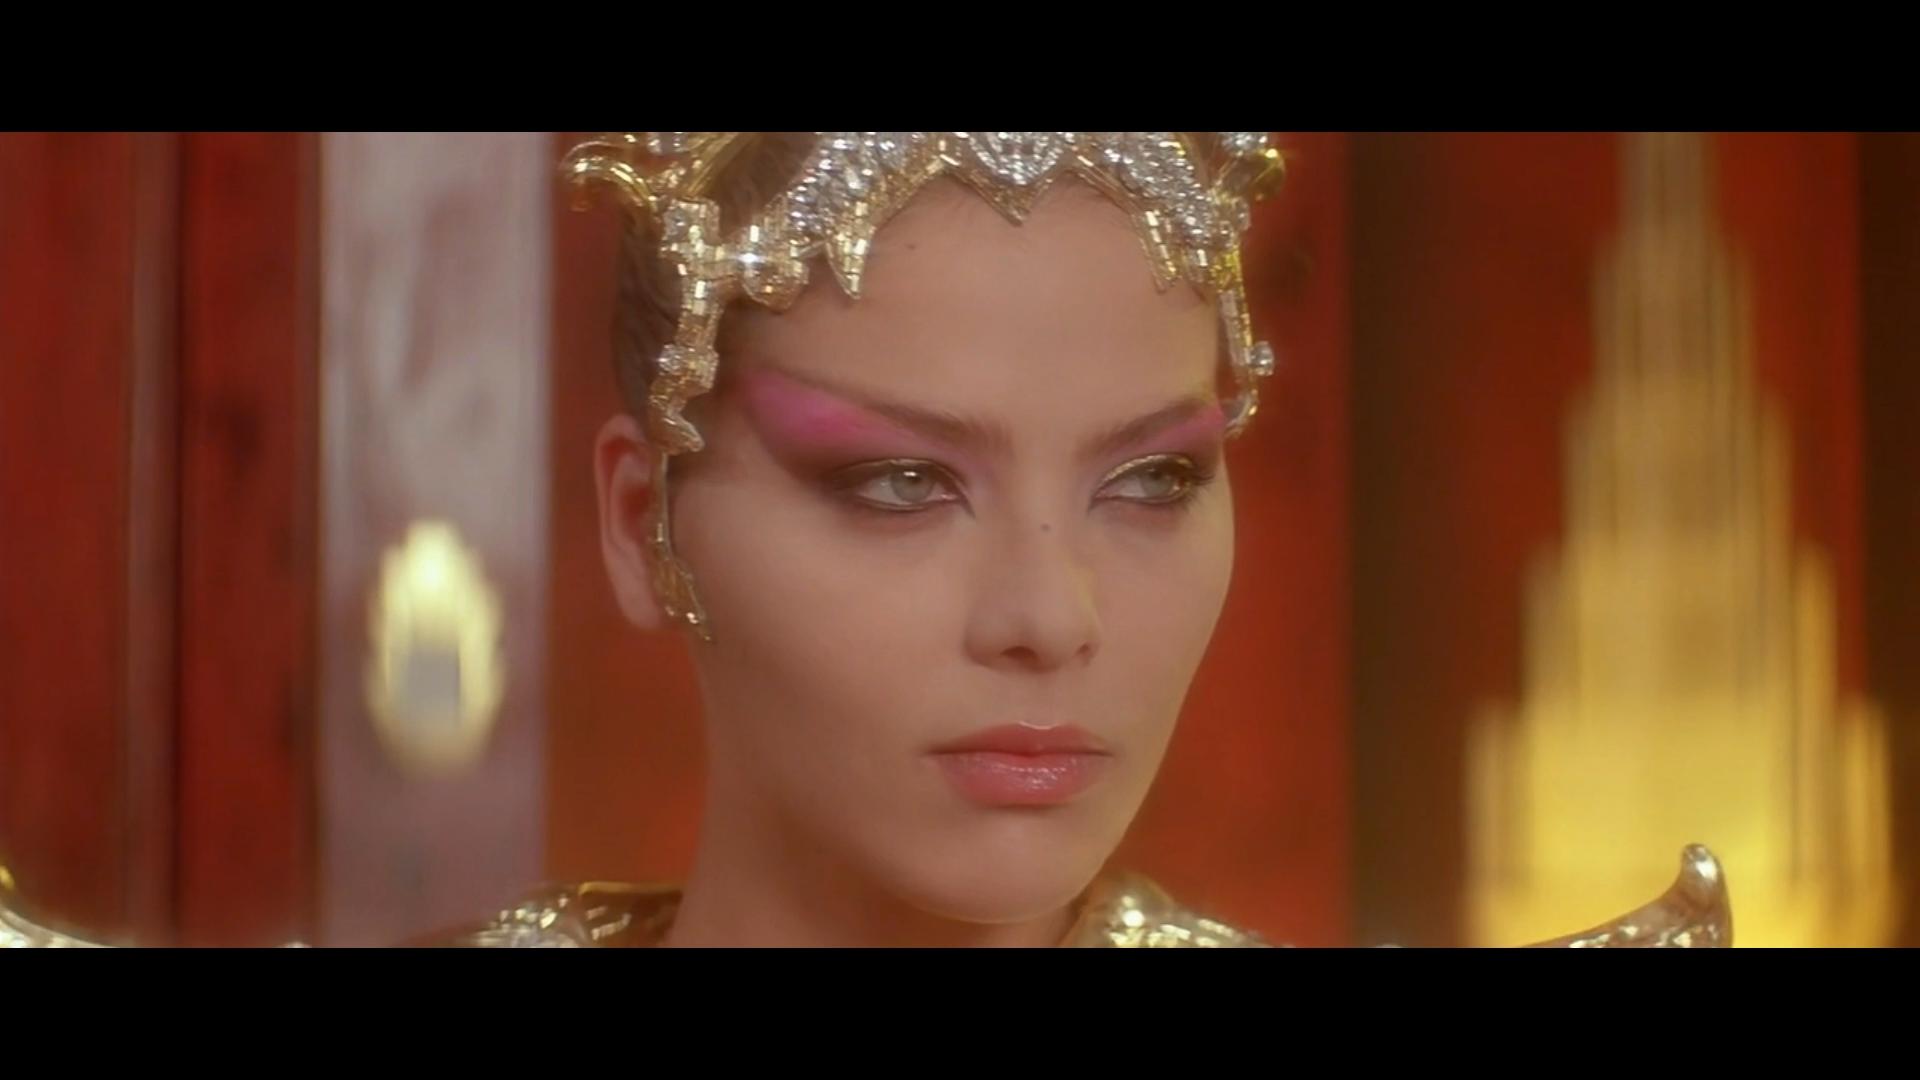 Ornella Muti as Princess Aura from 1980's Flash Gordon.